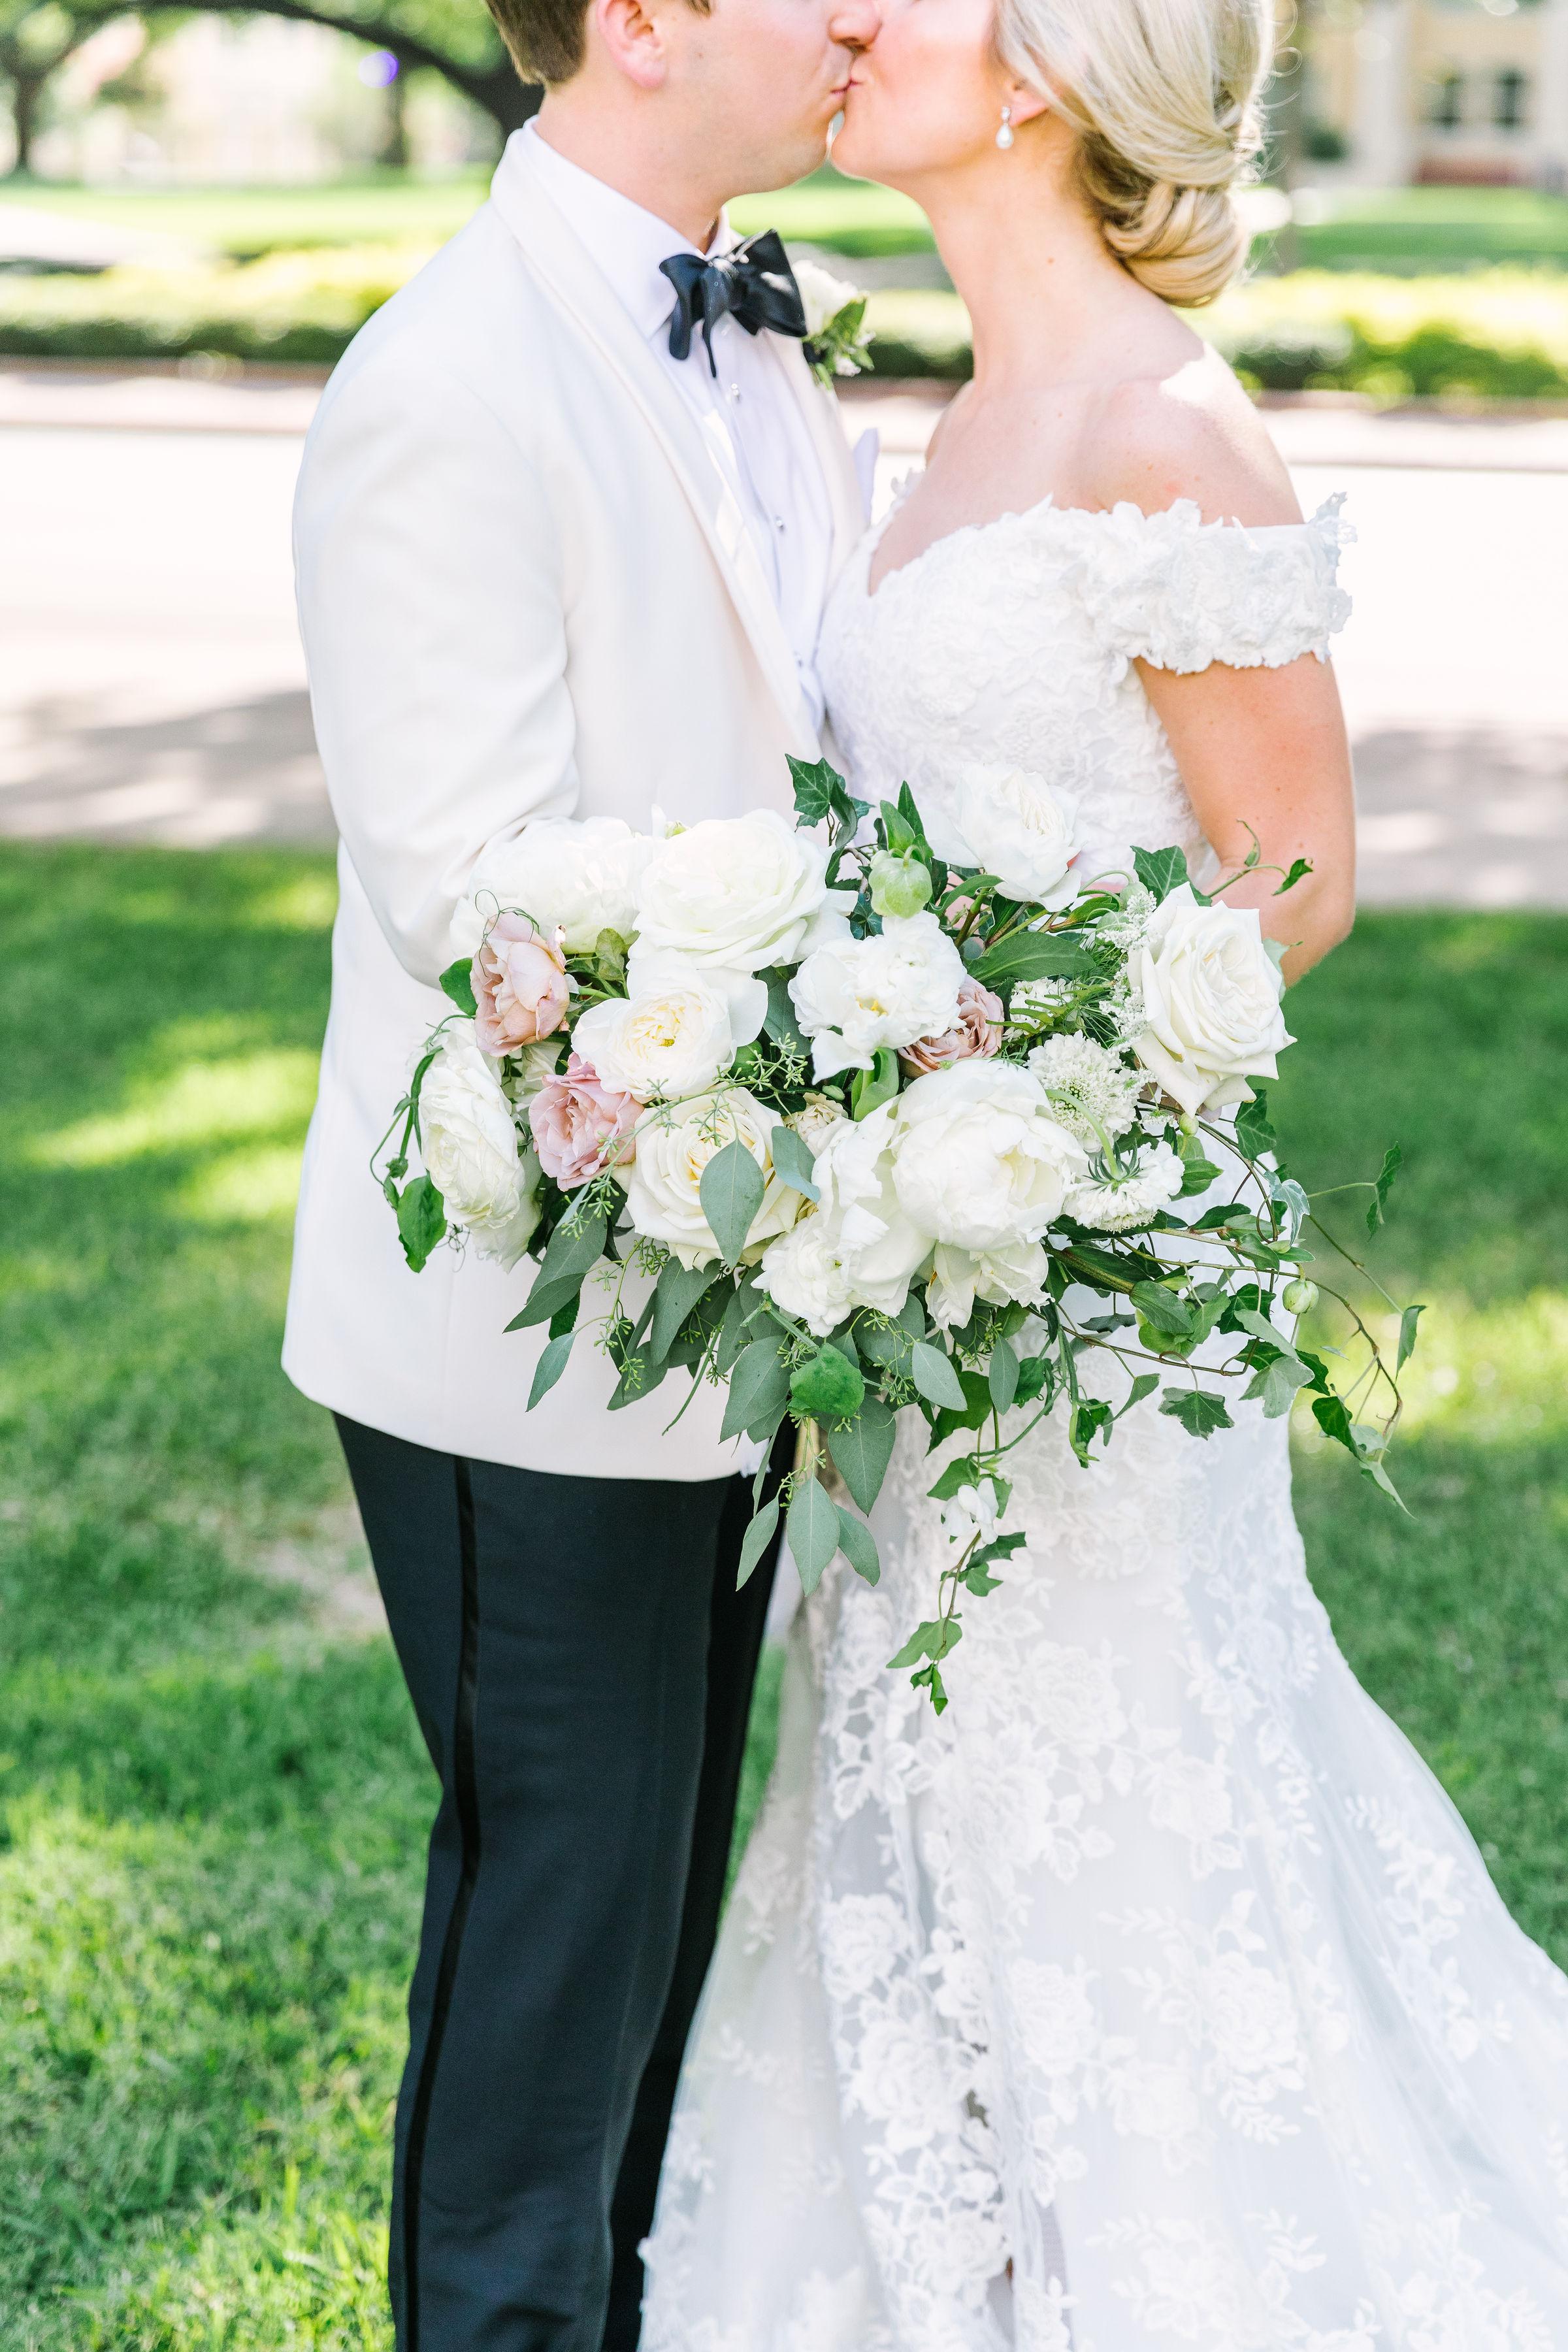 Ellen-Ashton-Photography-Girt-and-gold-events-weddings-Ashton-Depot-Weddings227.jpg